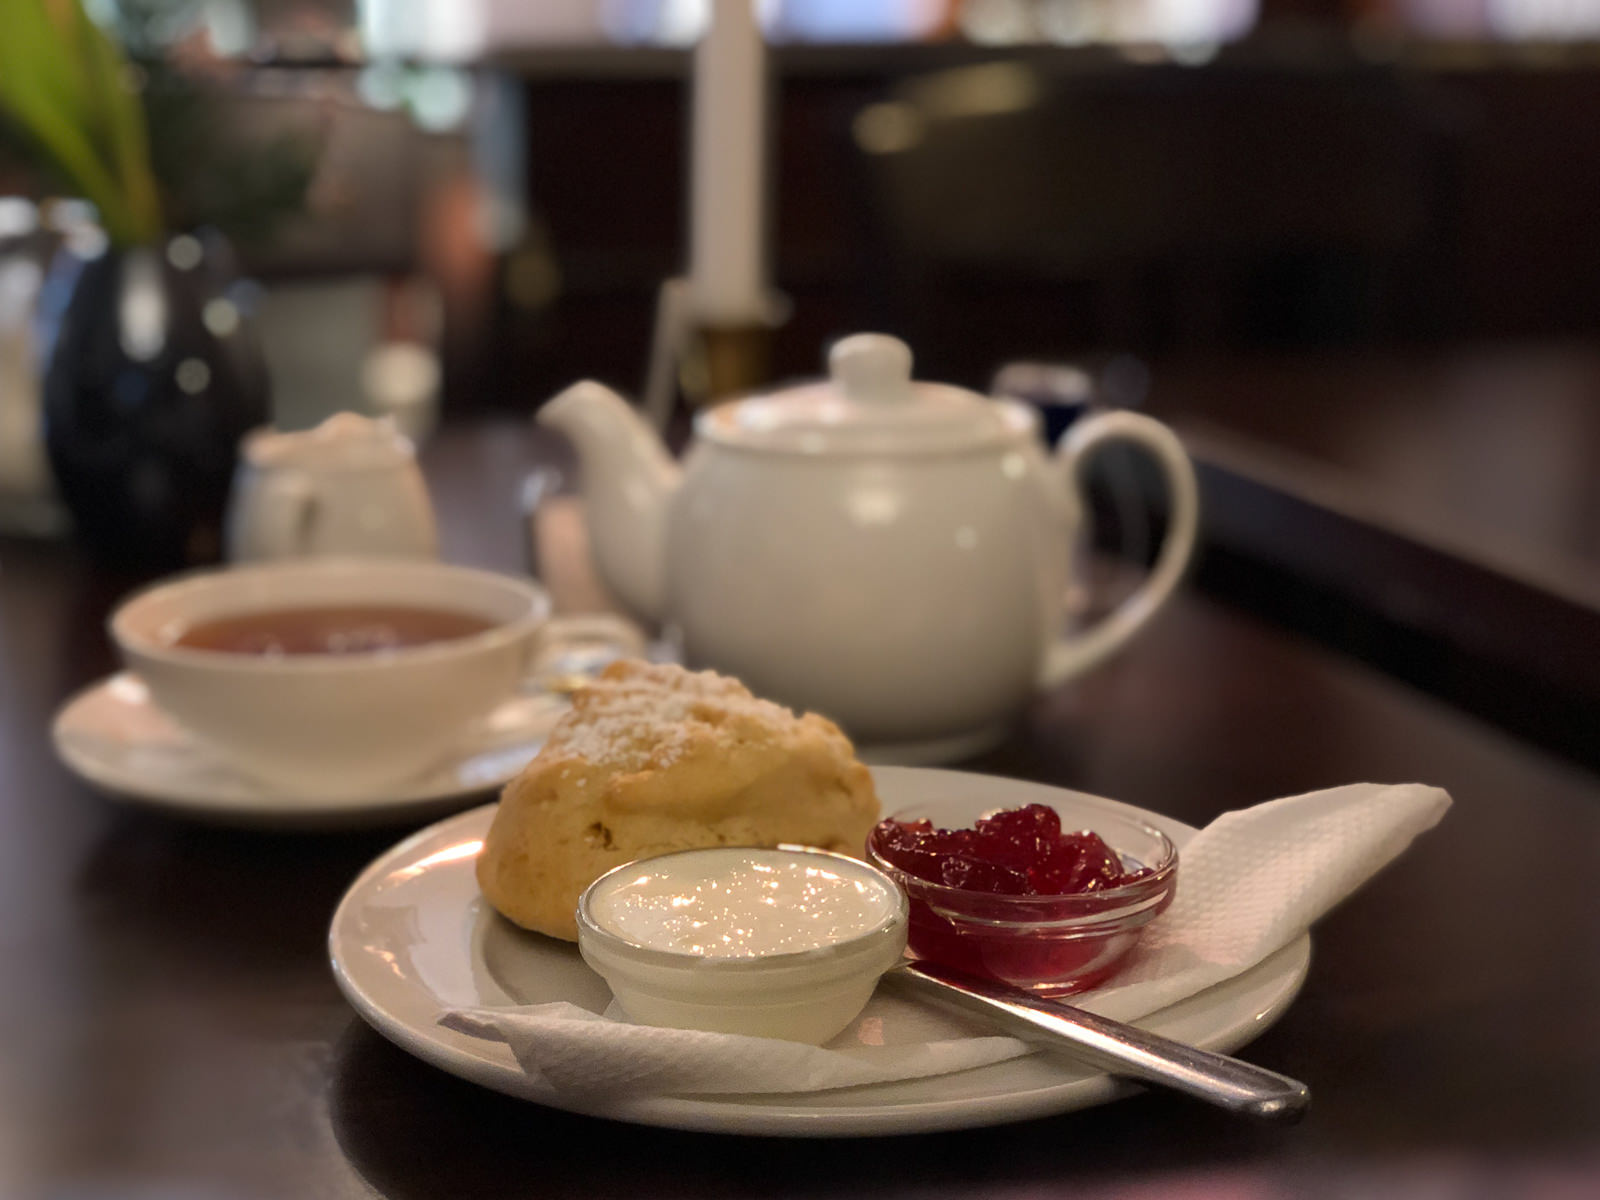 Tee Tea Thé, Teestube, Teecafé, Café, Teeladen, Berlin, Teeshop